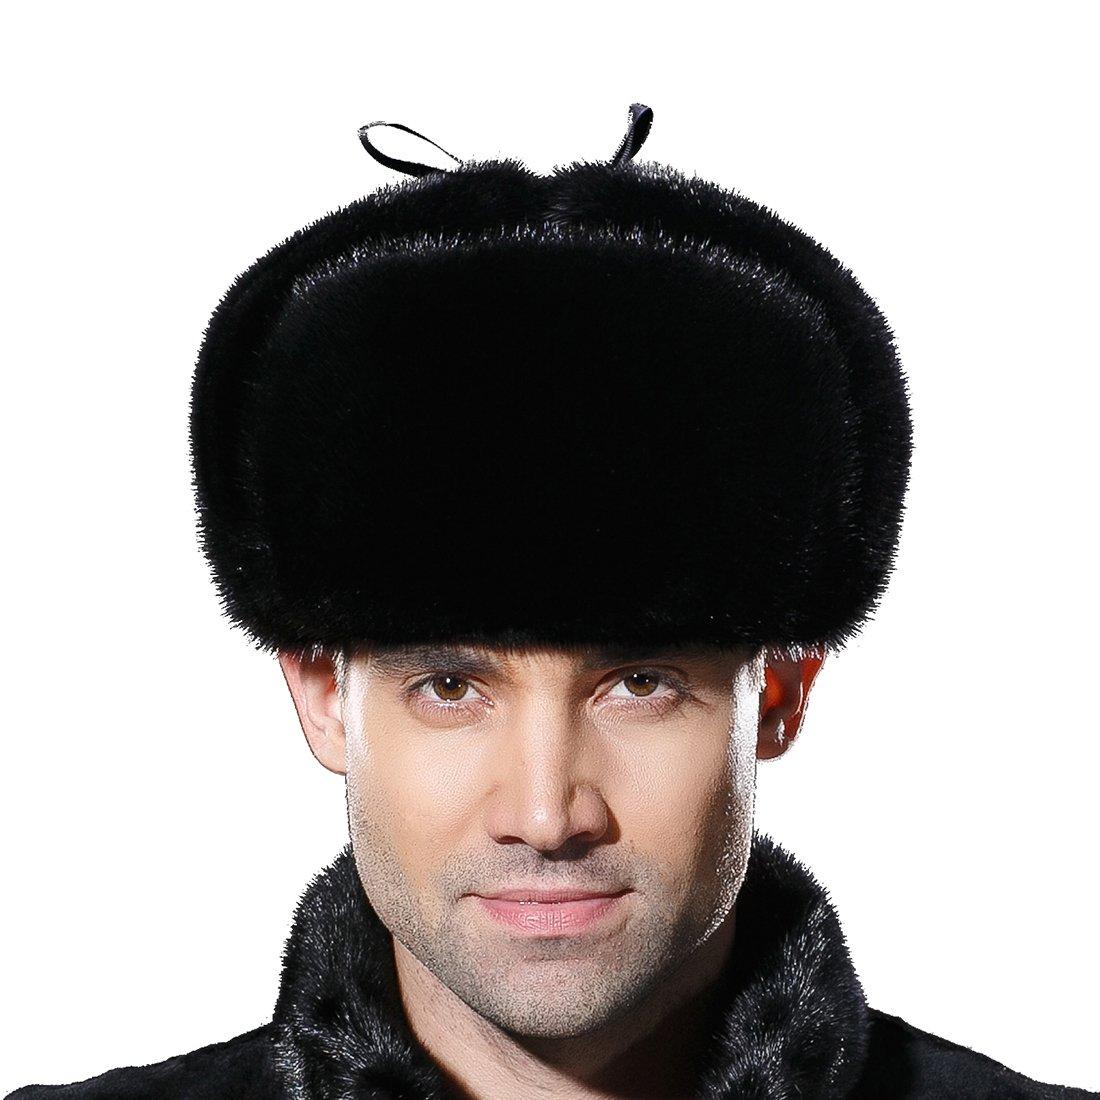 URSFUR Mens Russian Ushanka Hat Leather Winter Real Mink Fur Trapper Cap Black S by URSFUR